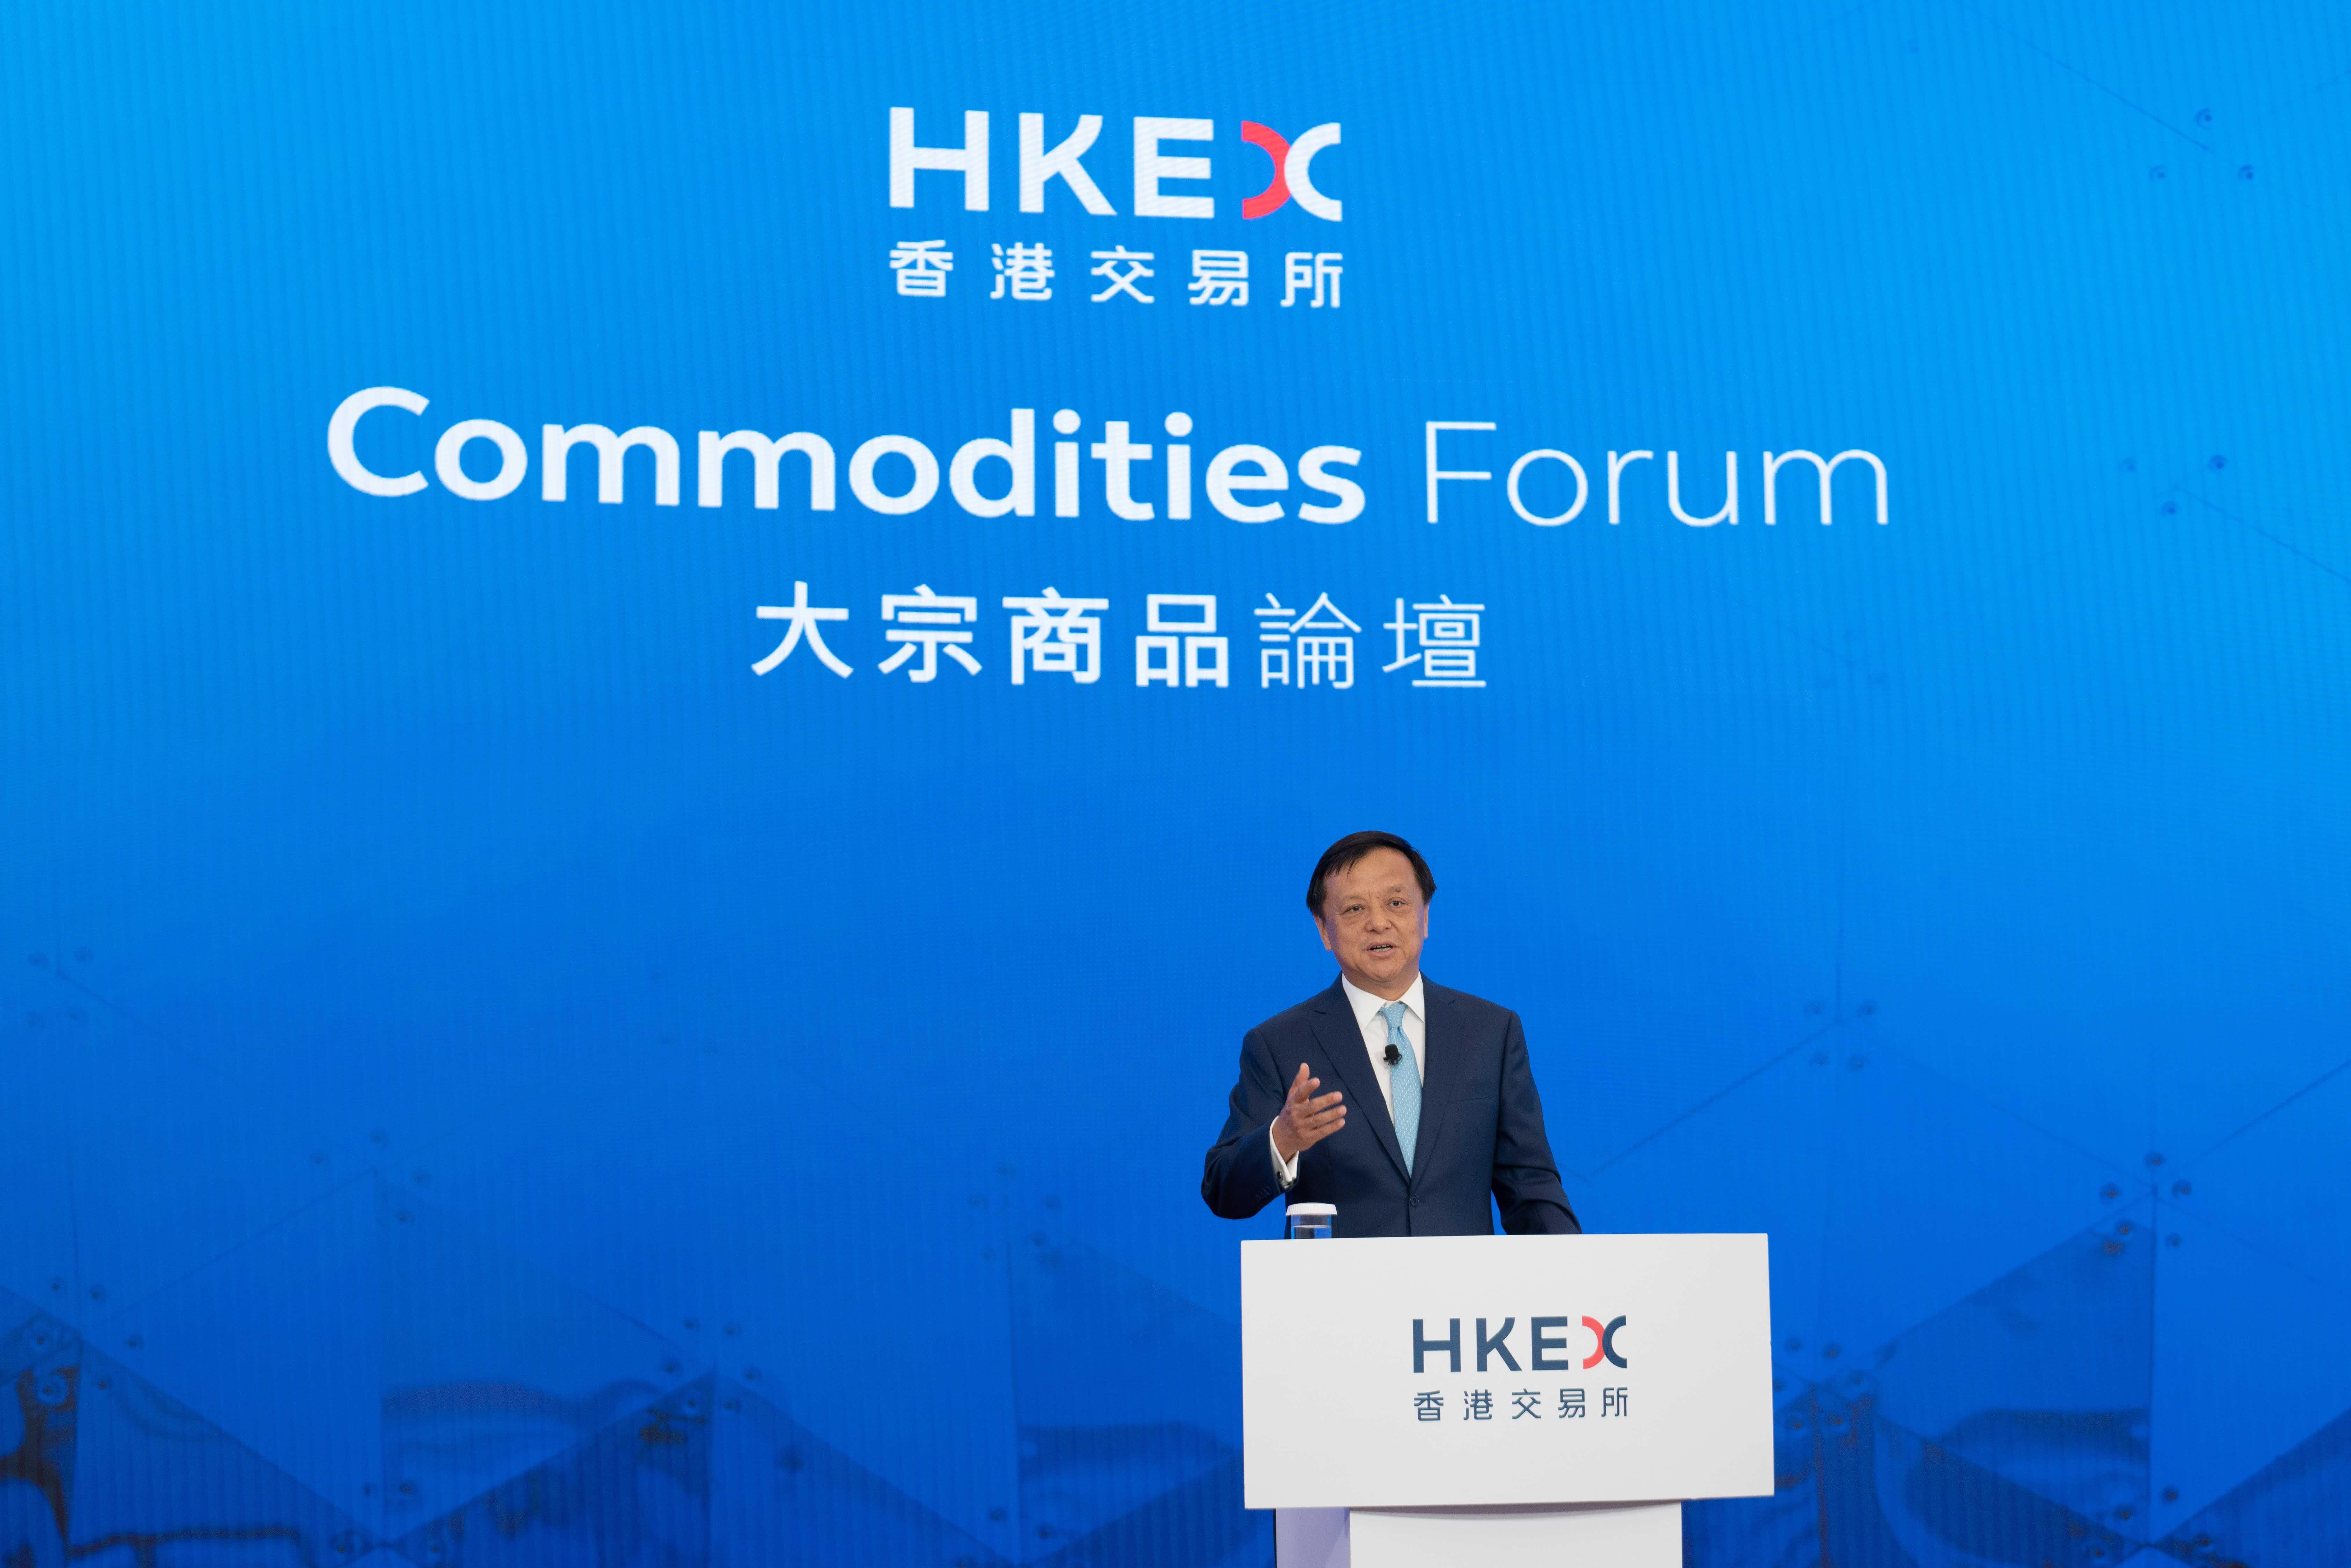 Commodities Forum 2020